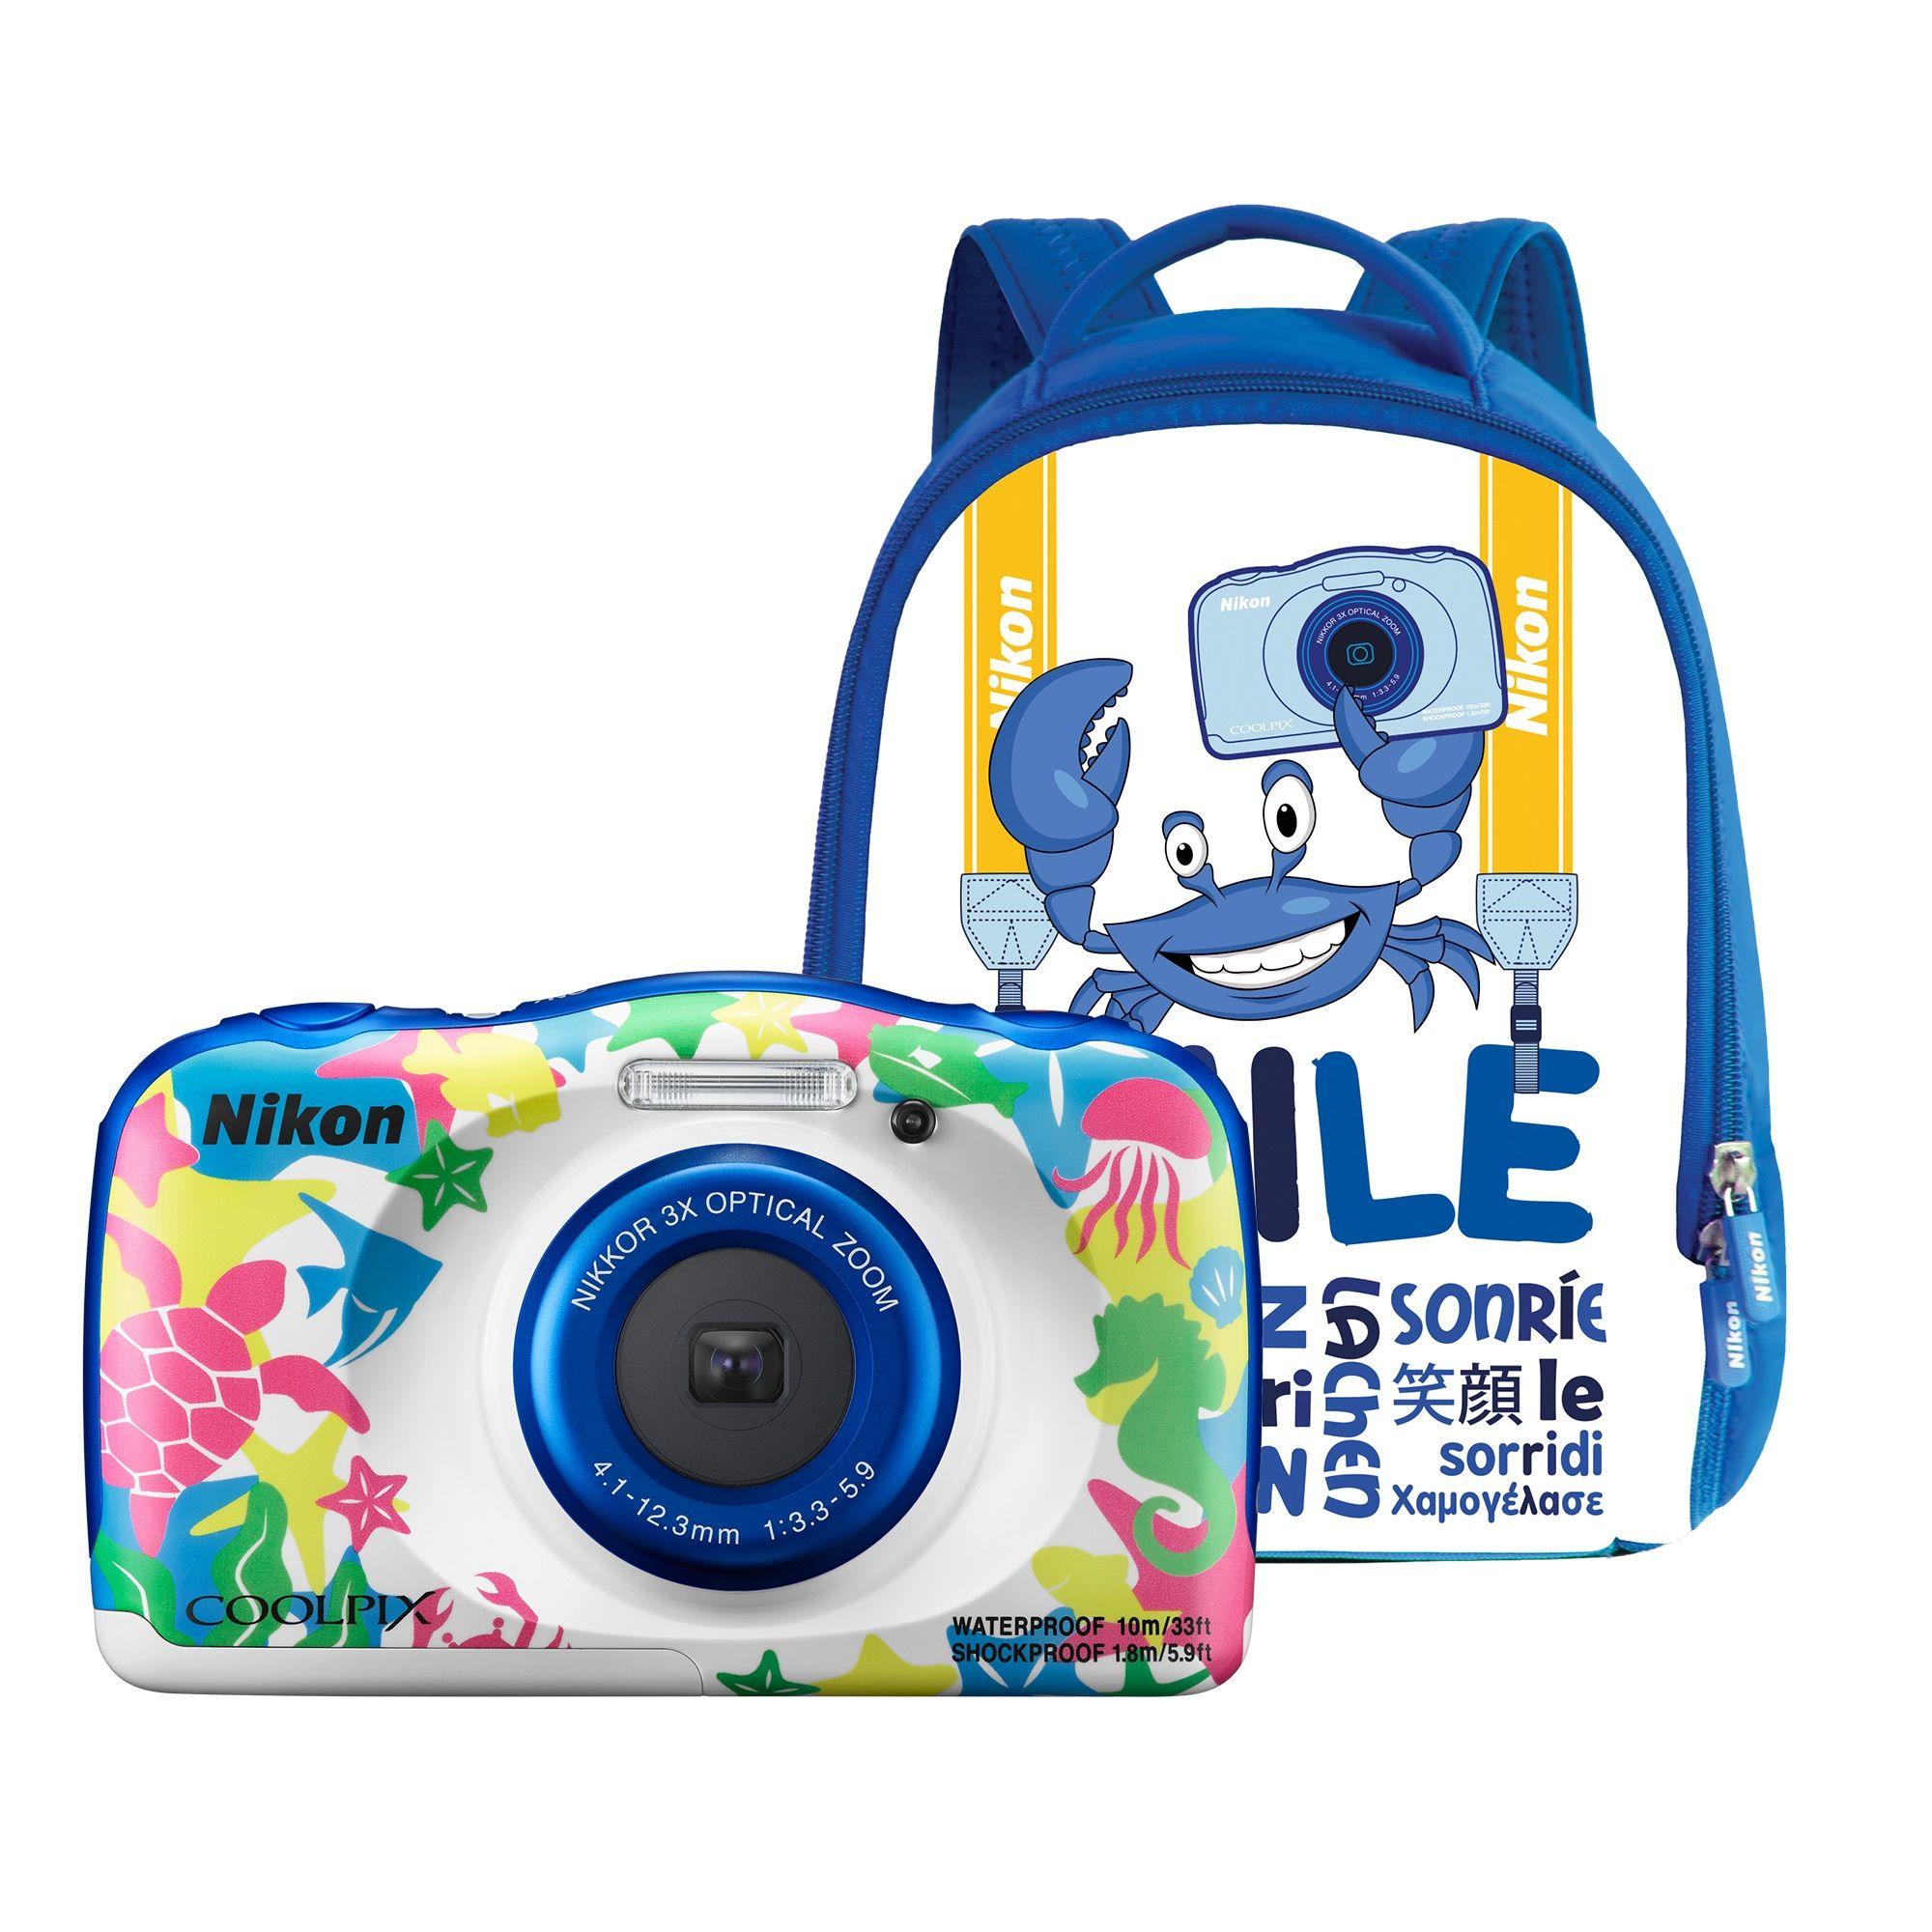 Aparat Foto Compact Nikon COOLPIX WATERPROOF W100 Backpack Kit Multicolor